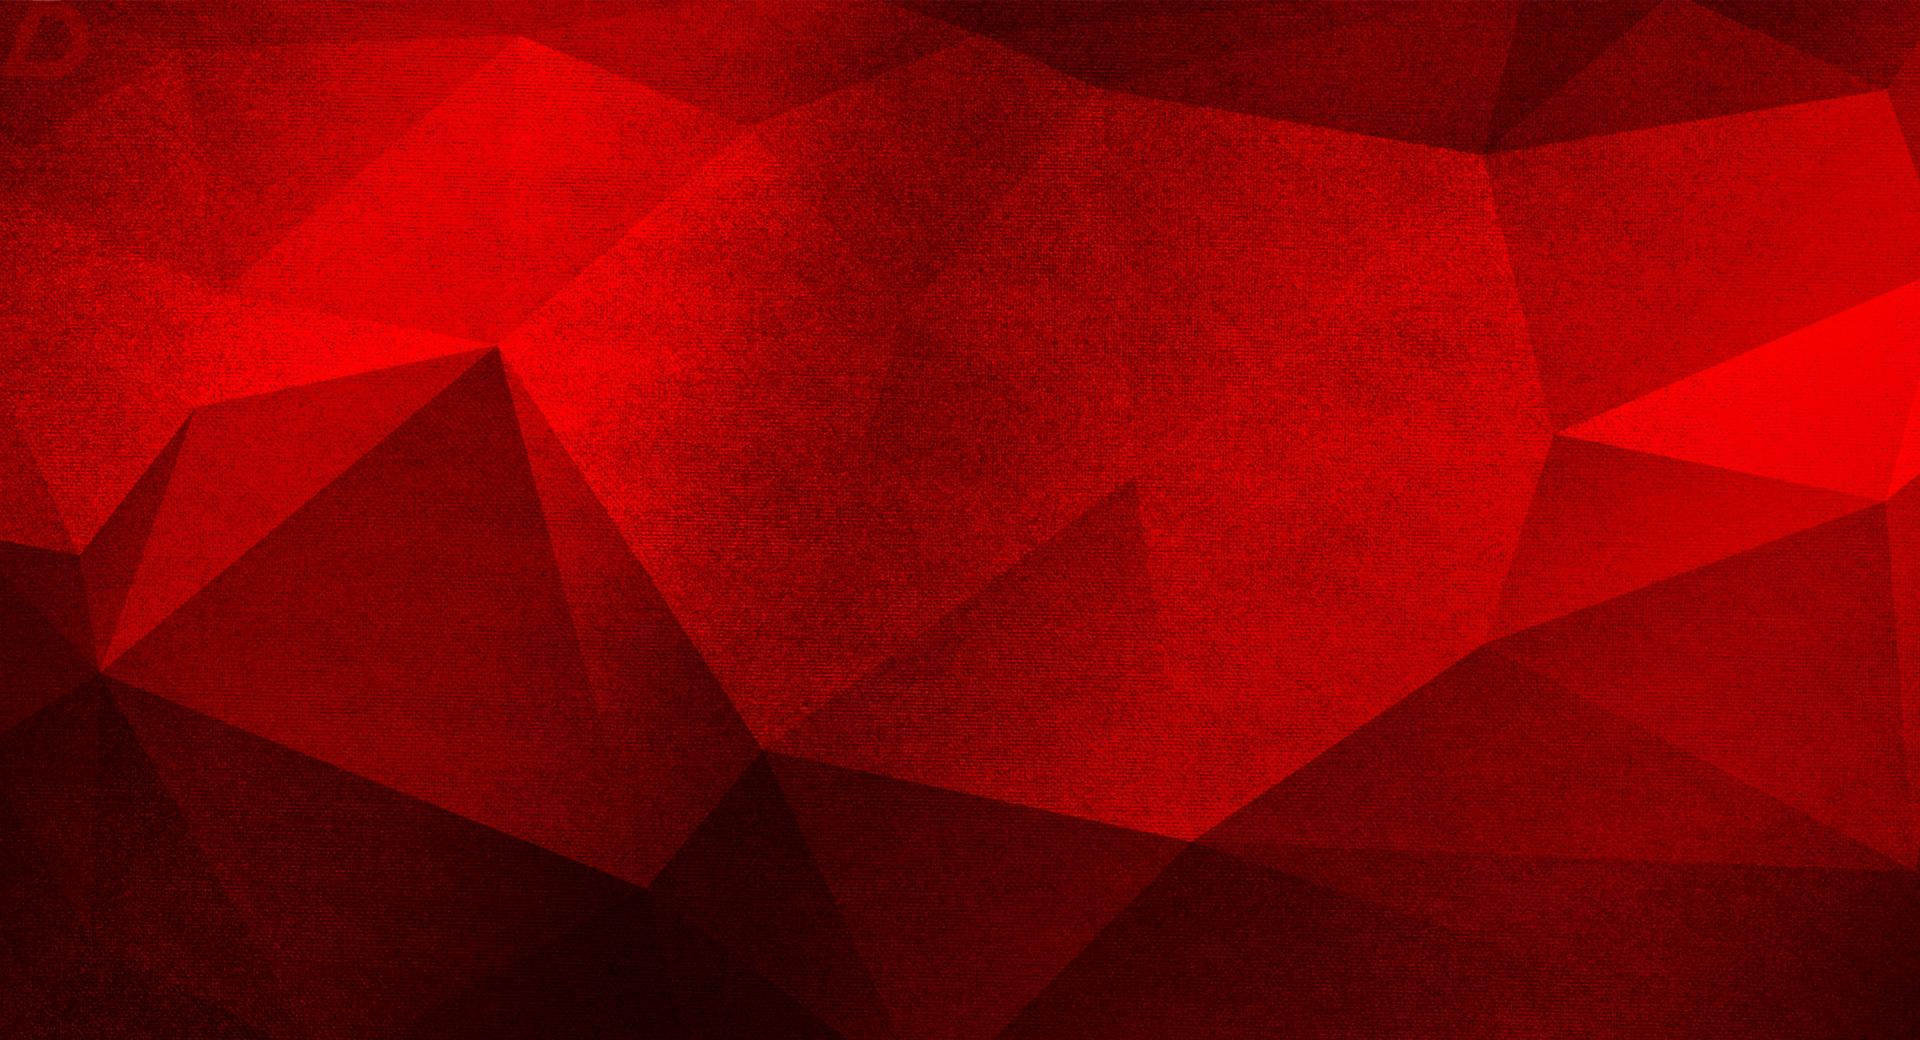 Geometric Fiber wm wallpapers HD quality